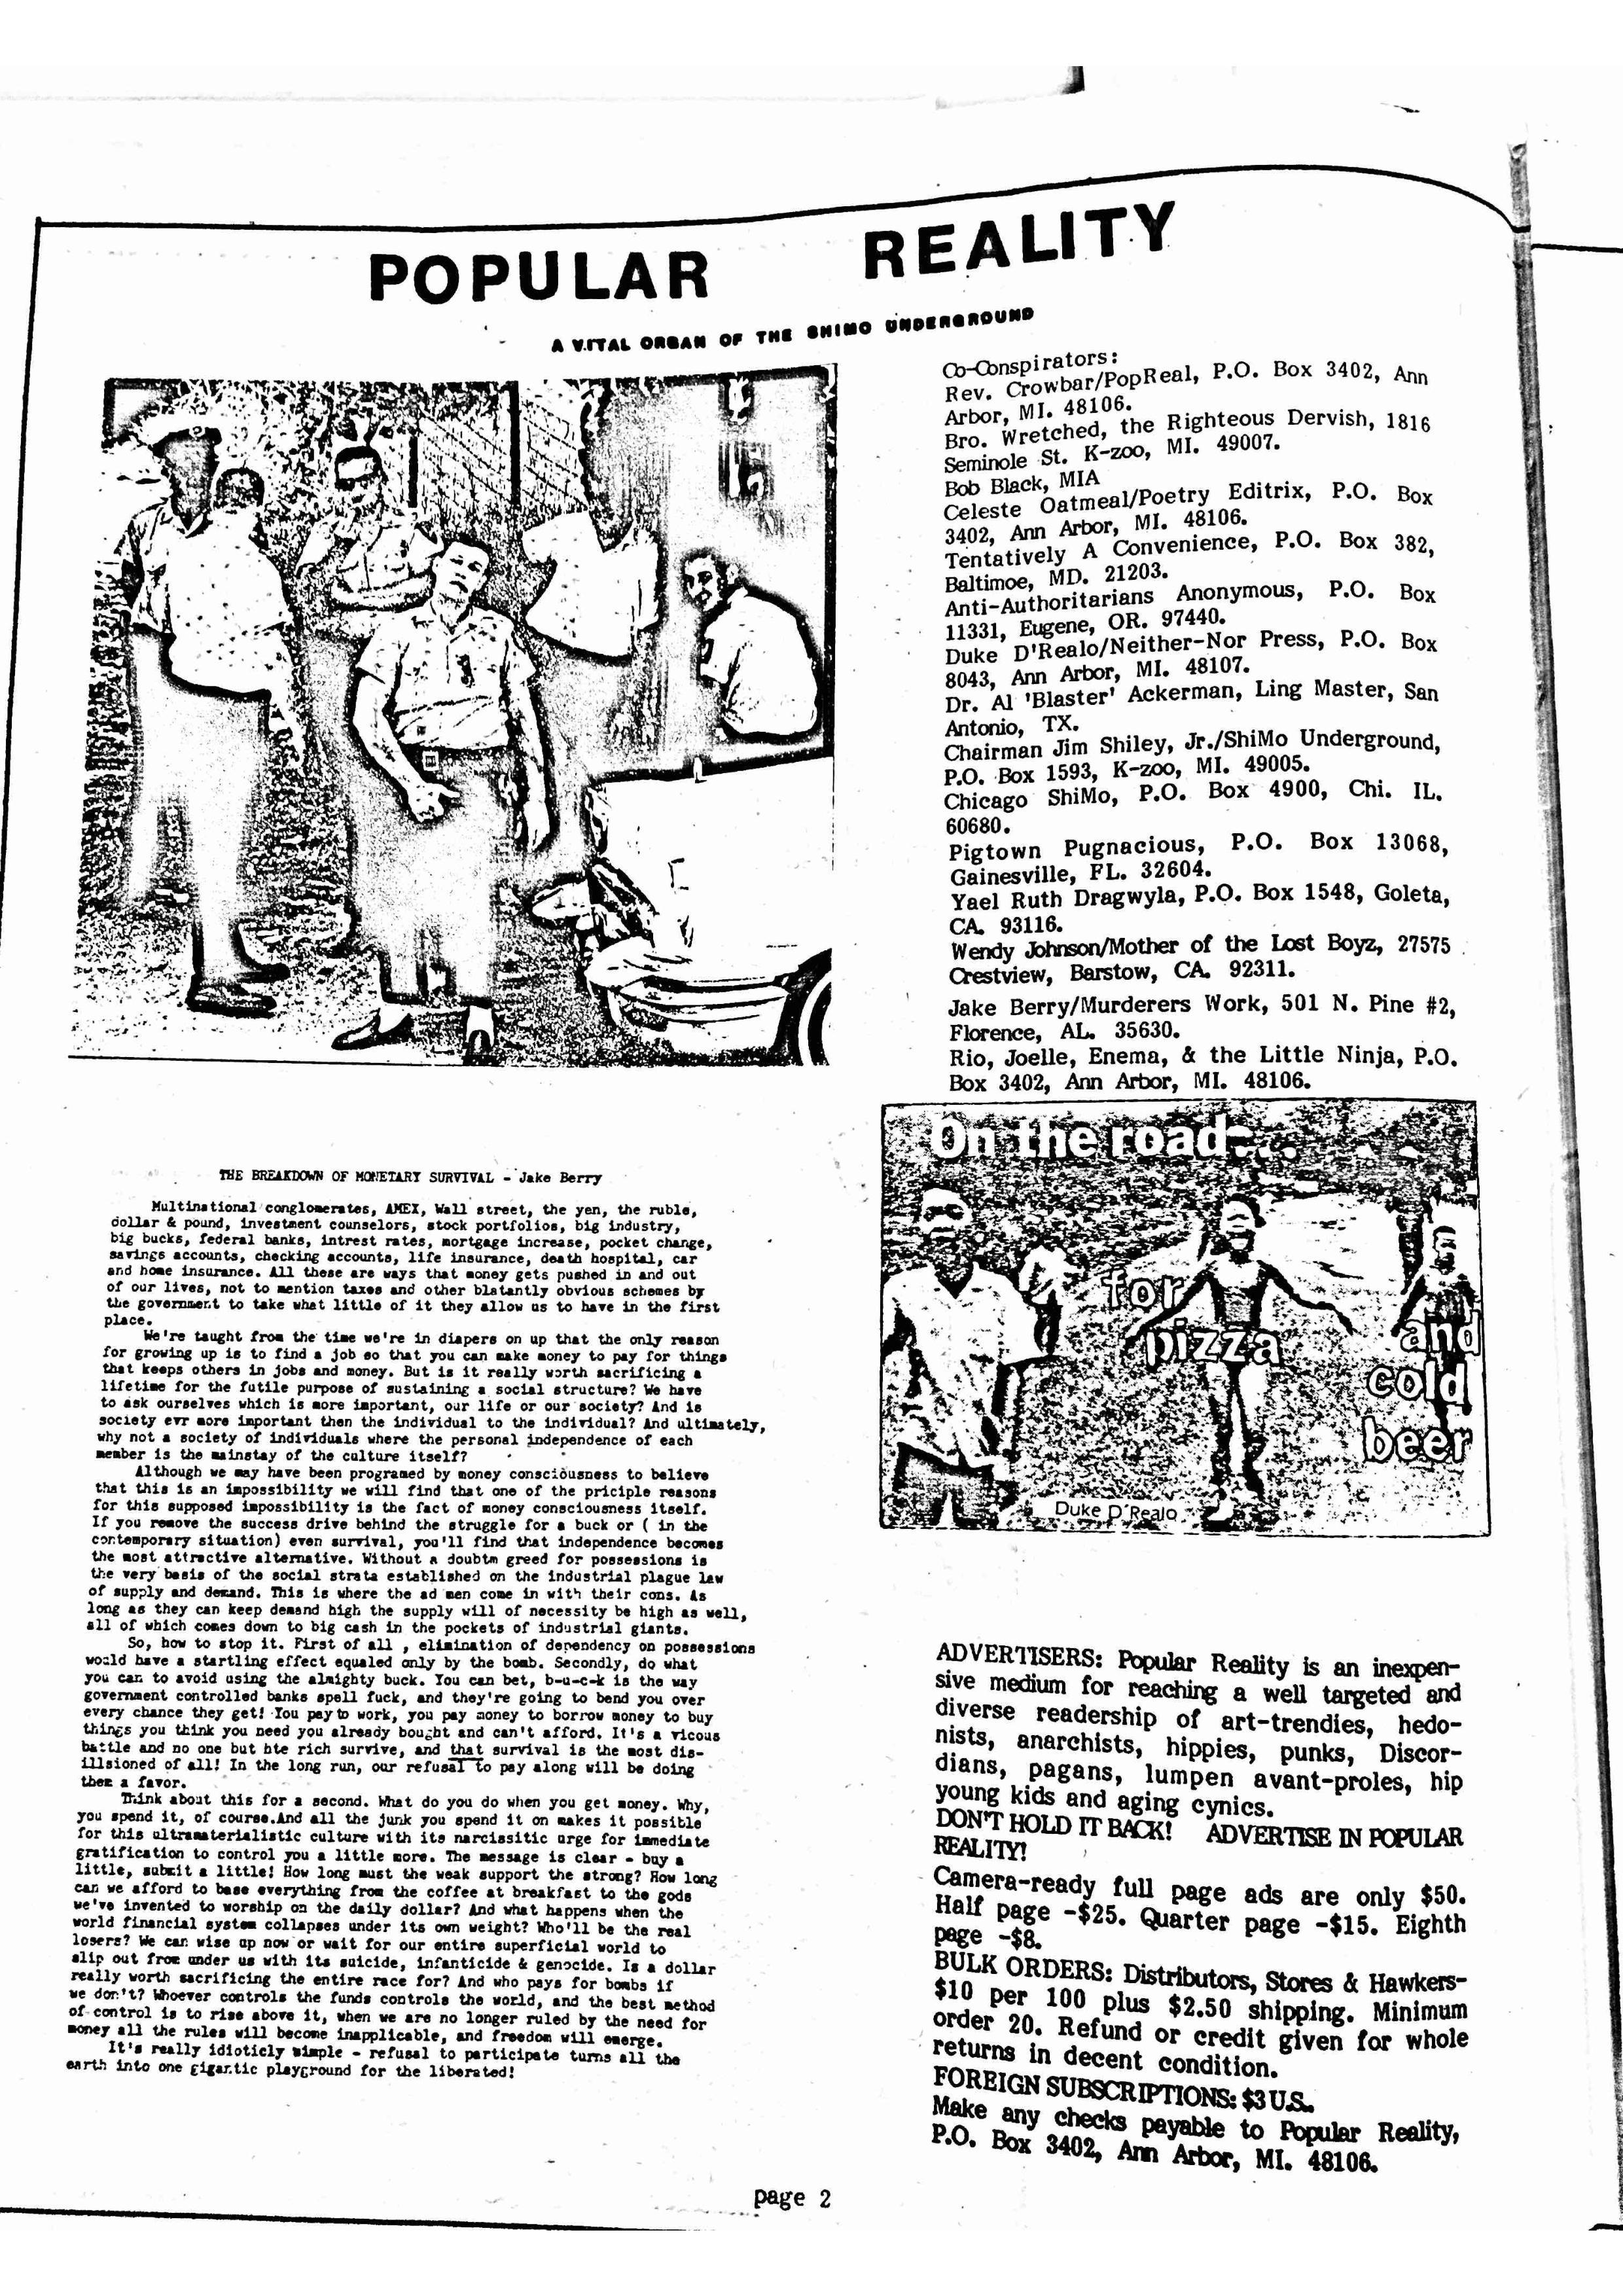 PopRealNo10-page-002.jpg